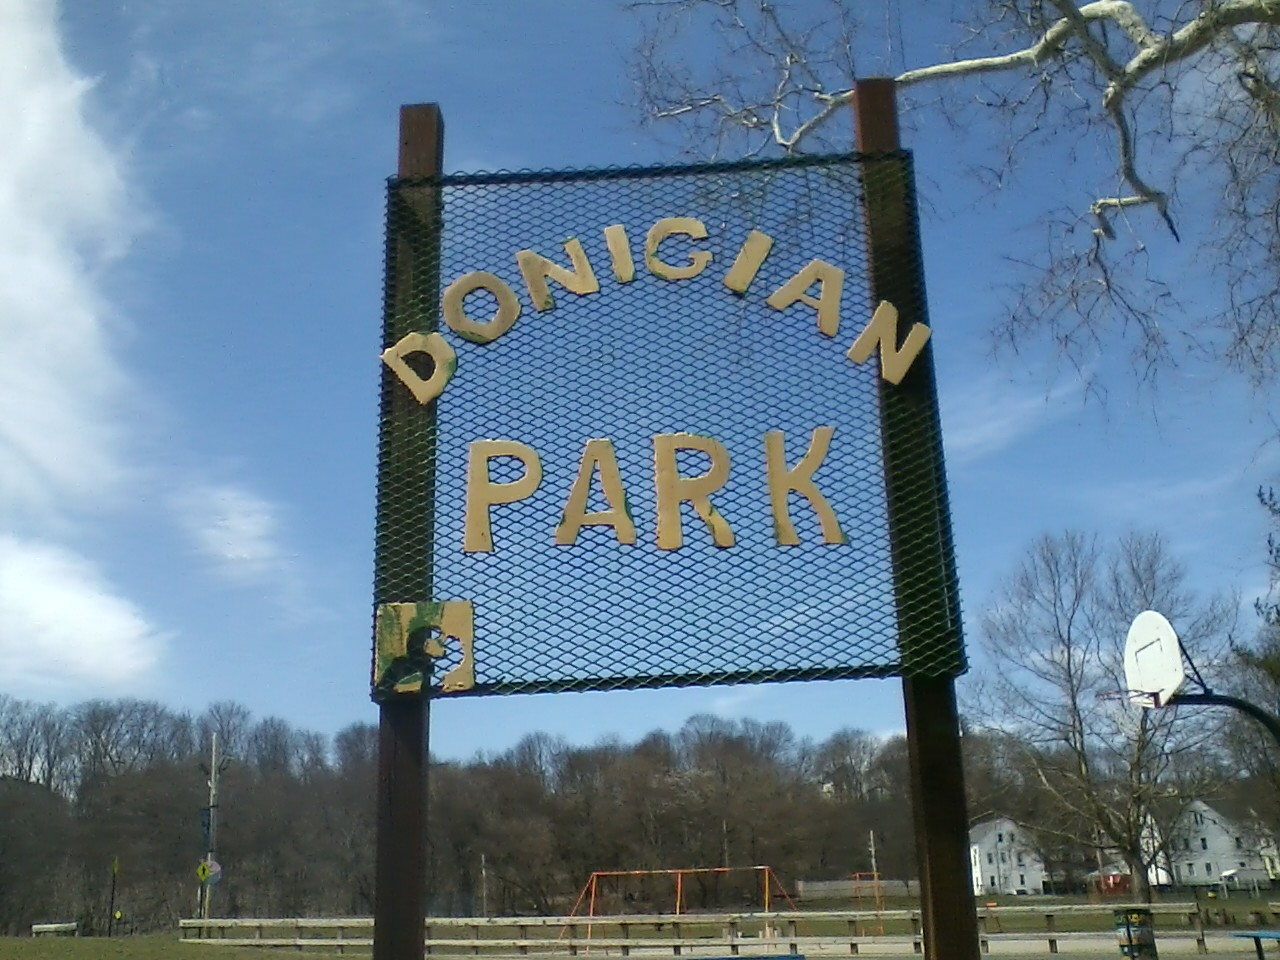 Donigian Park